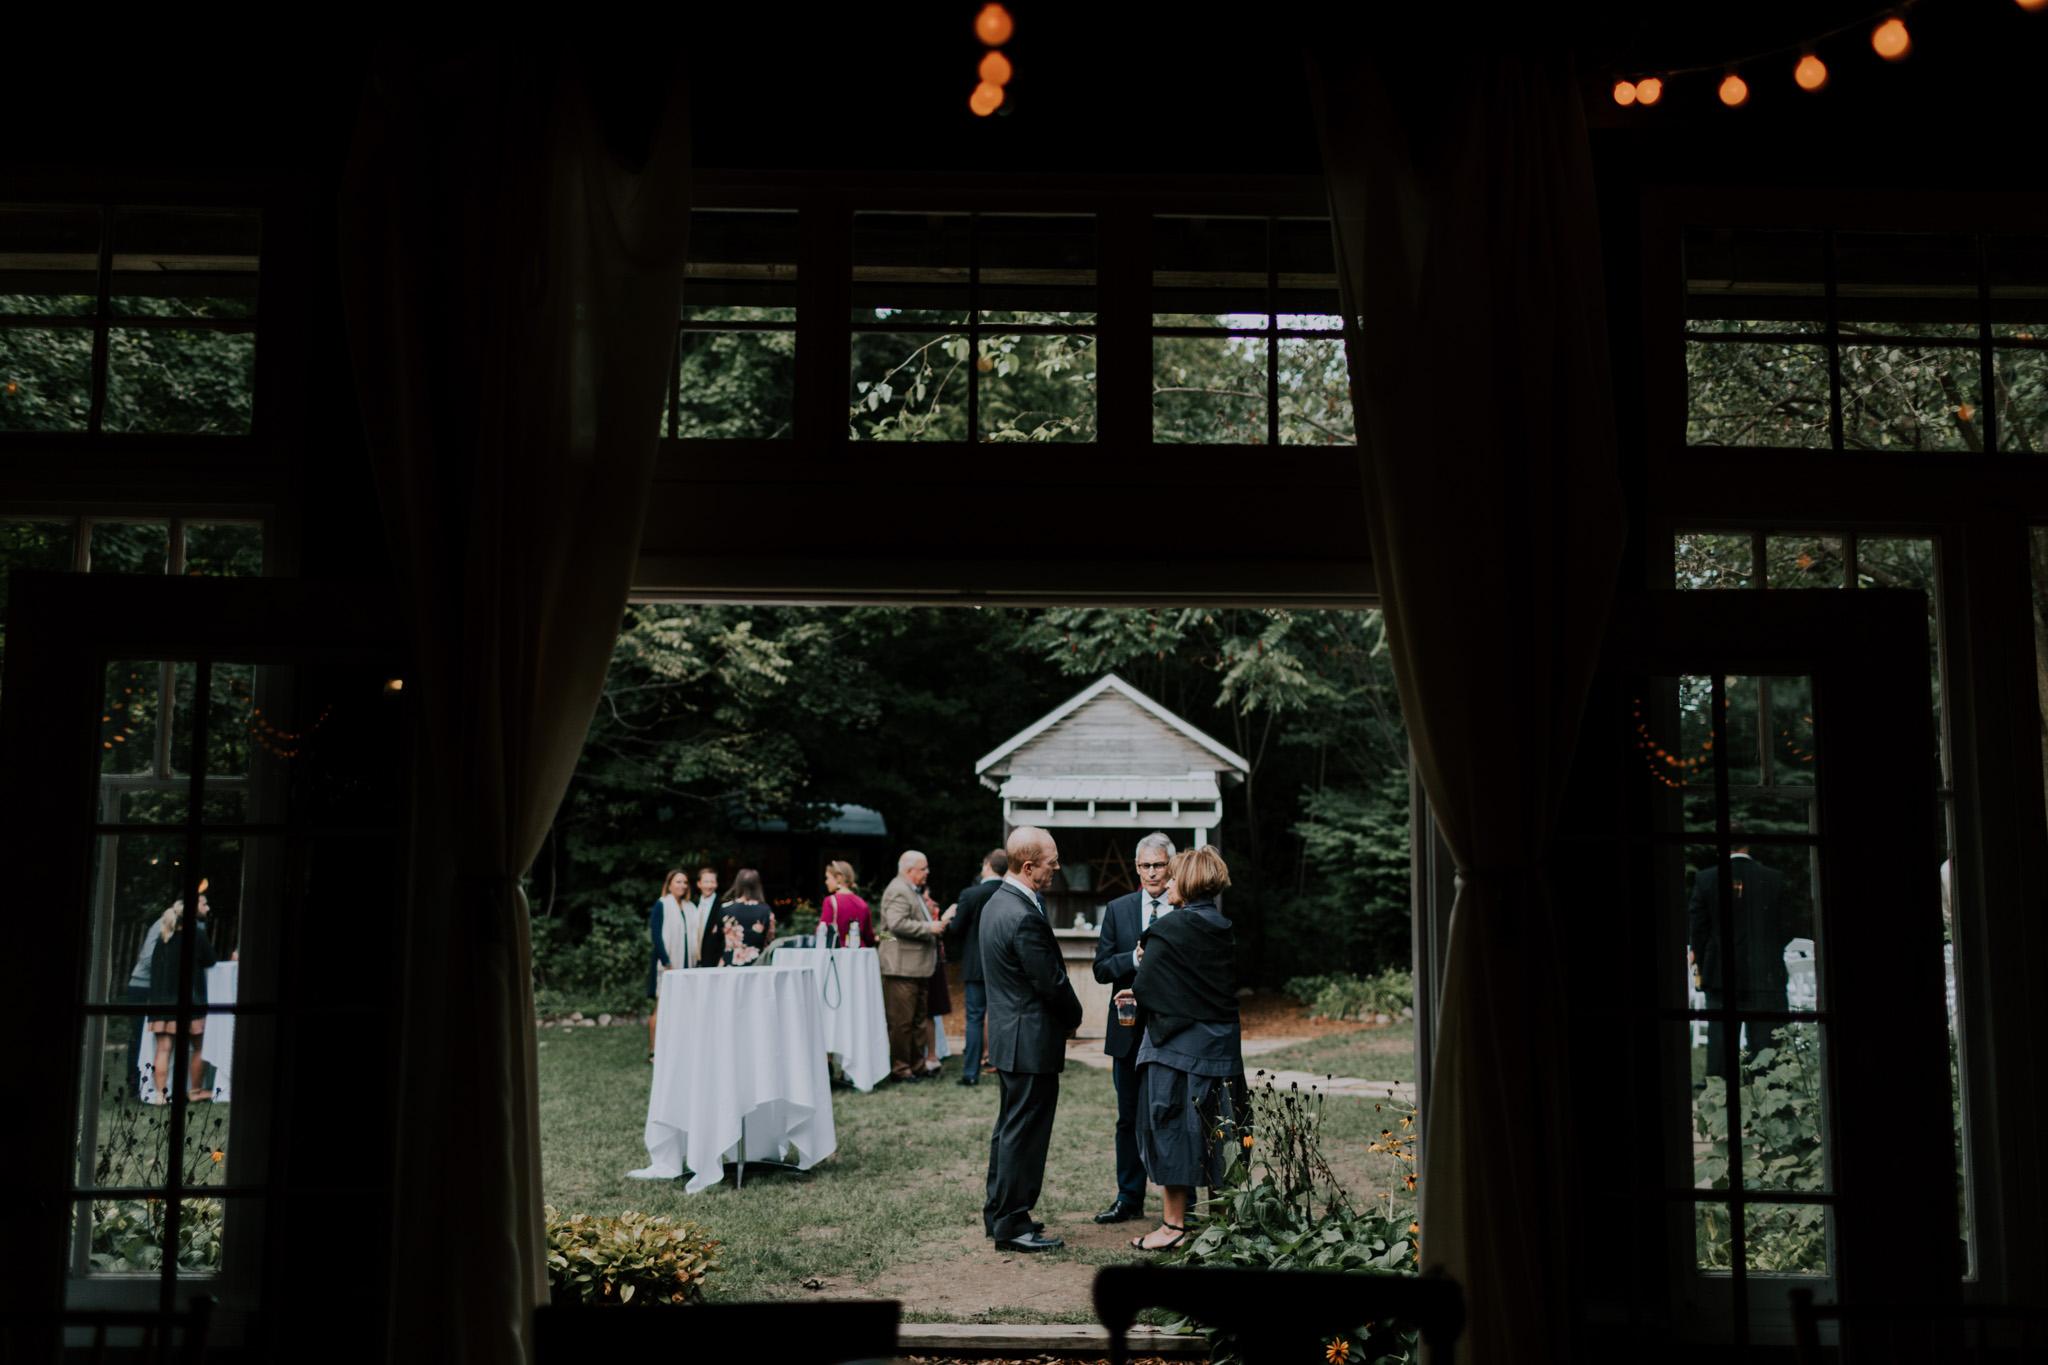 MillCreek-Wilde-Wedding-Barn-Michigan-Eliza-Eric-Vafa-Photo788.jpg